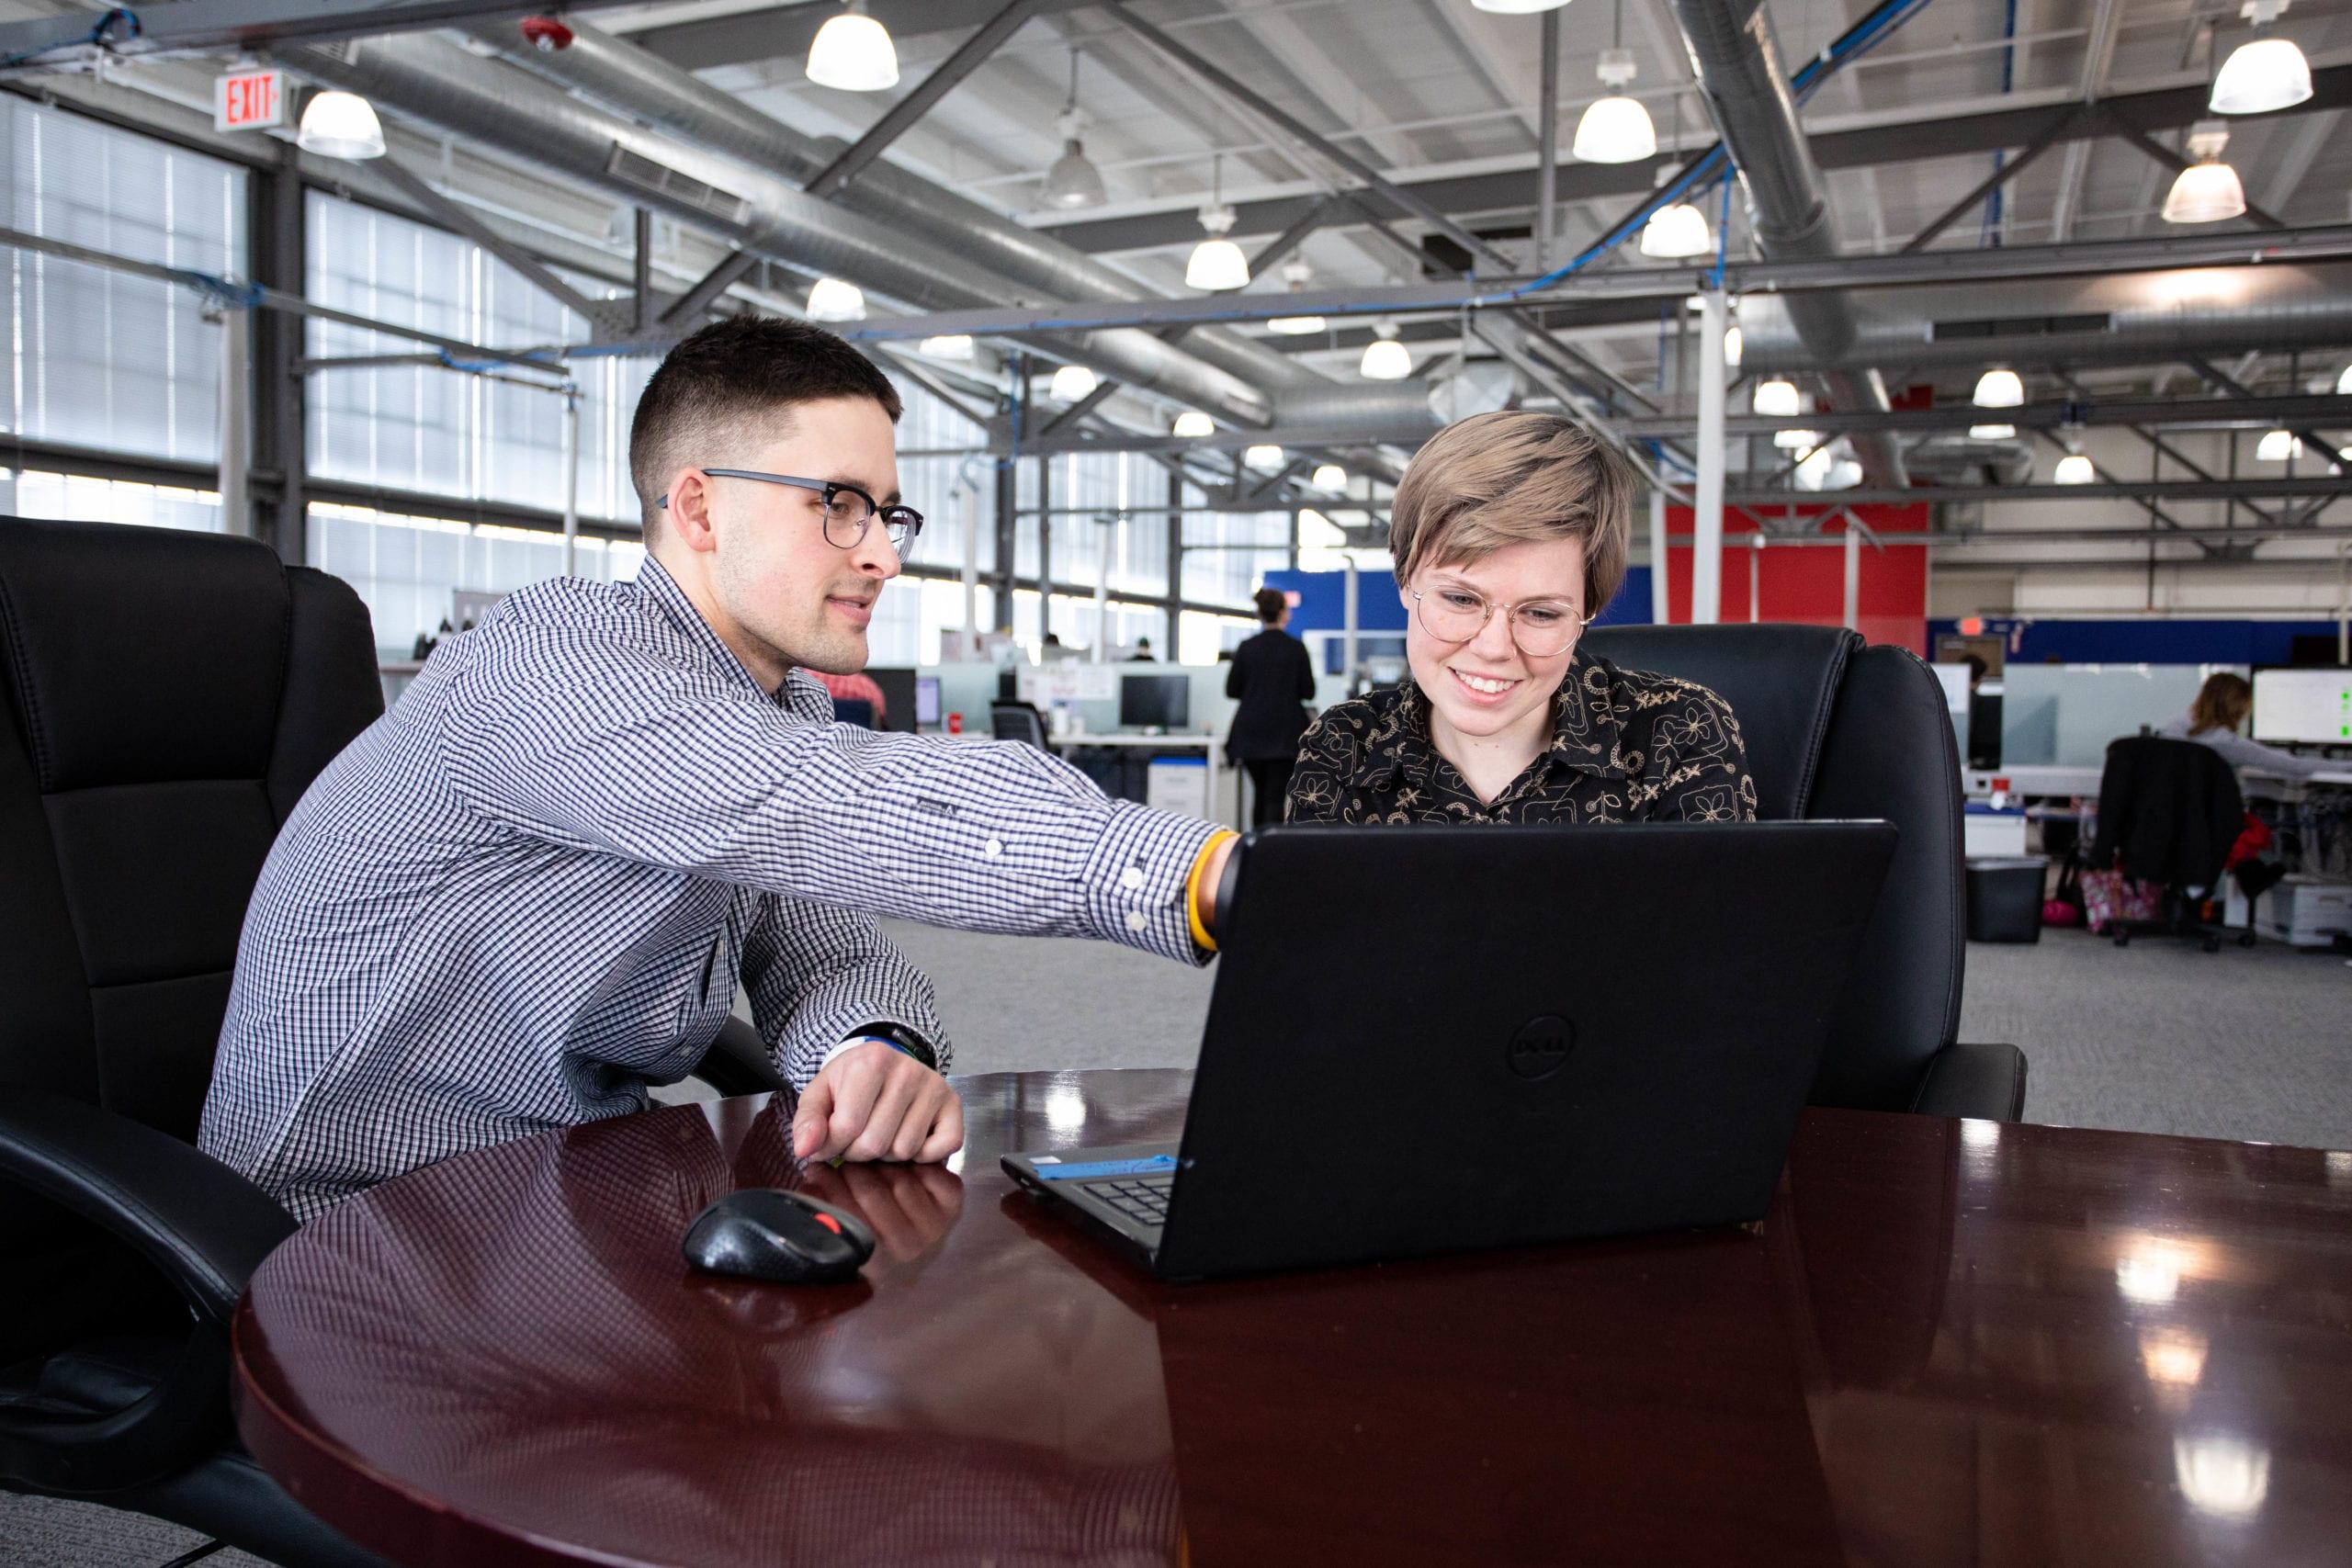 digital marketing team works on reputation management